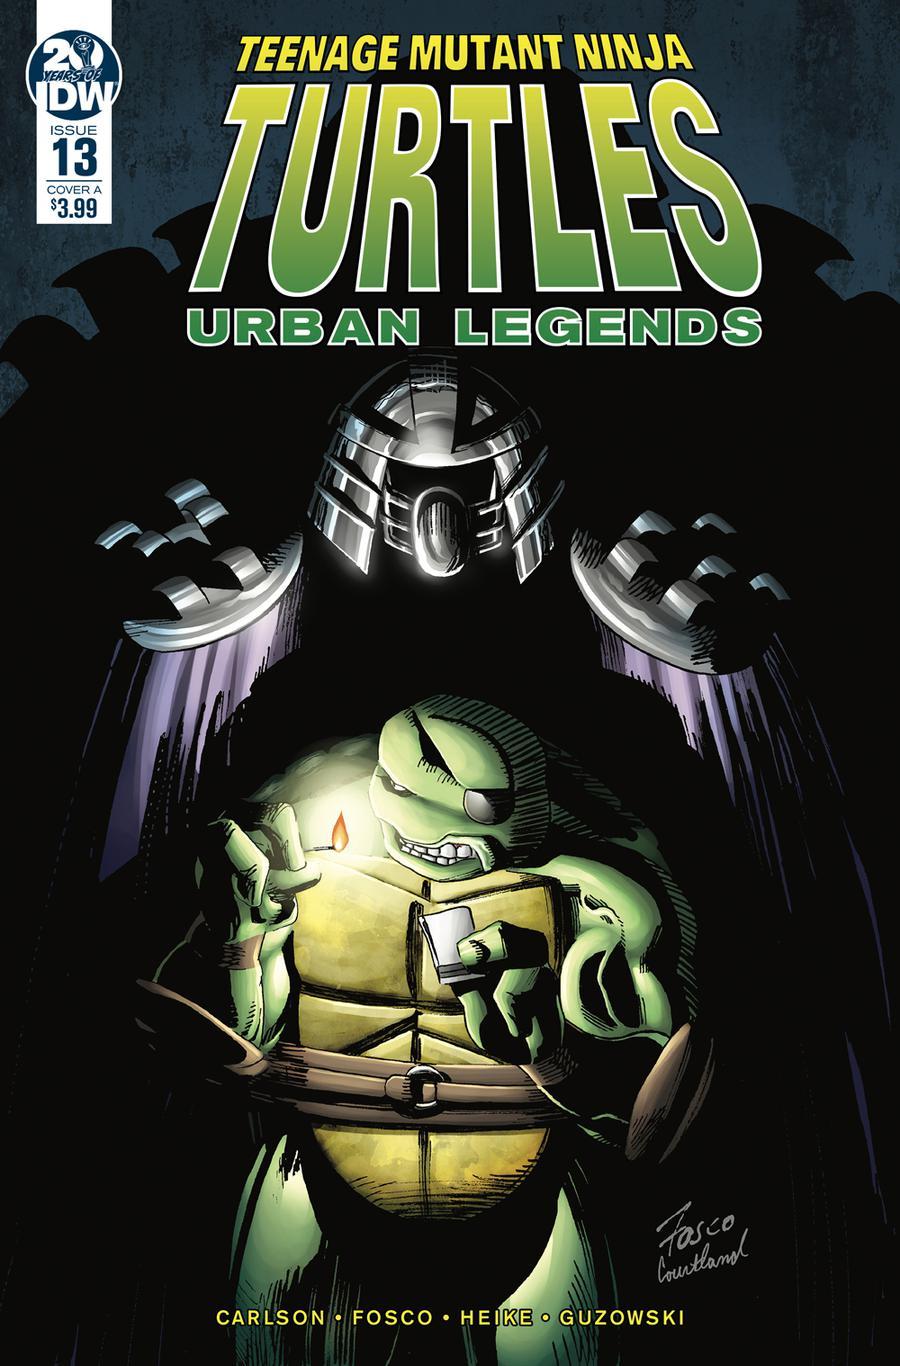 Teenage Mutant Ninja Turtles Urban Legends #13 Cover A Regular Frank Fosco Cover